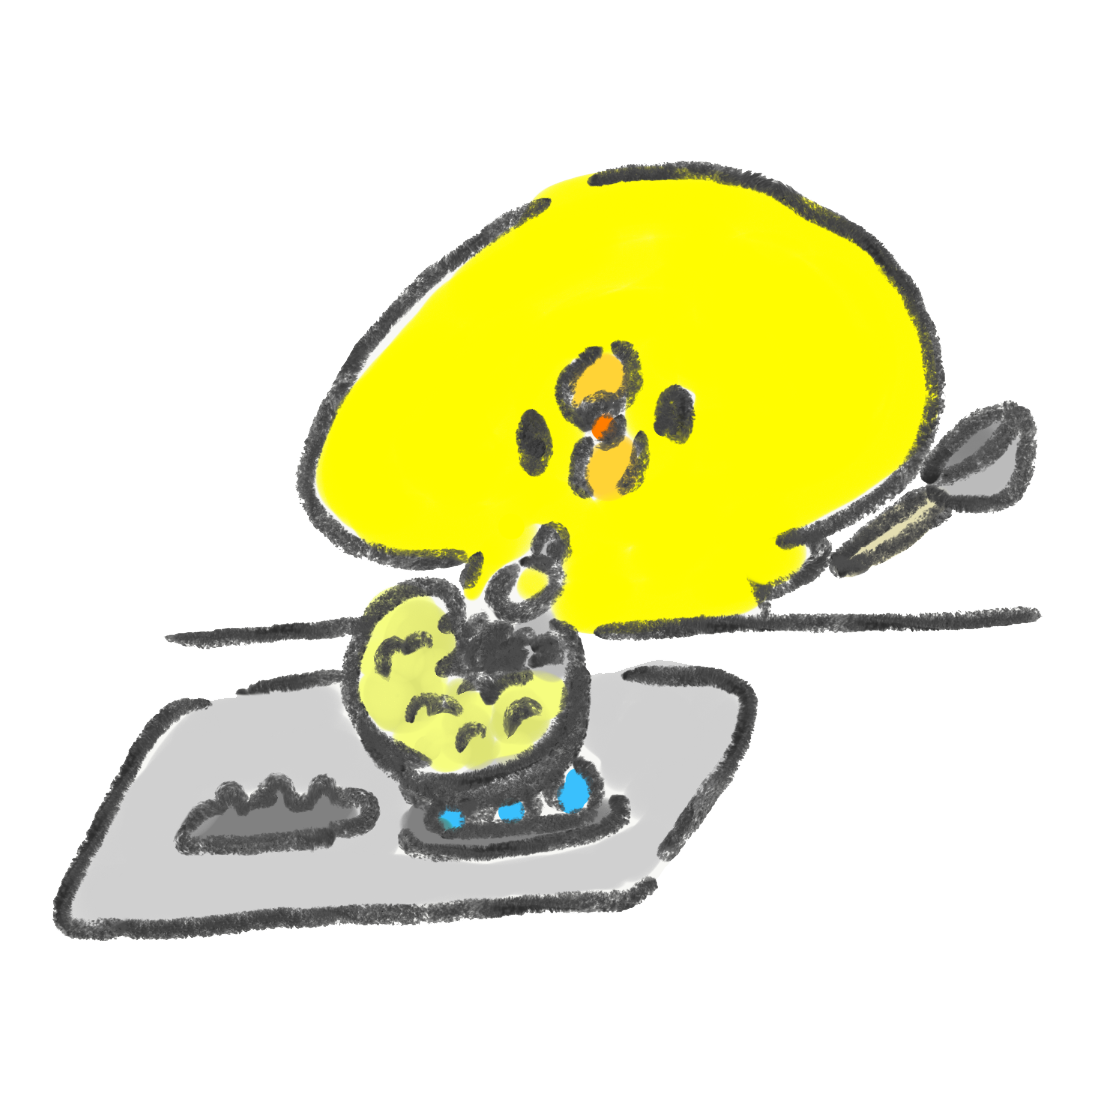 f:id:furikakeoishi:20210529144120p:plain